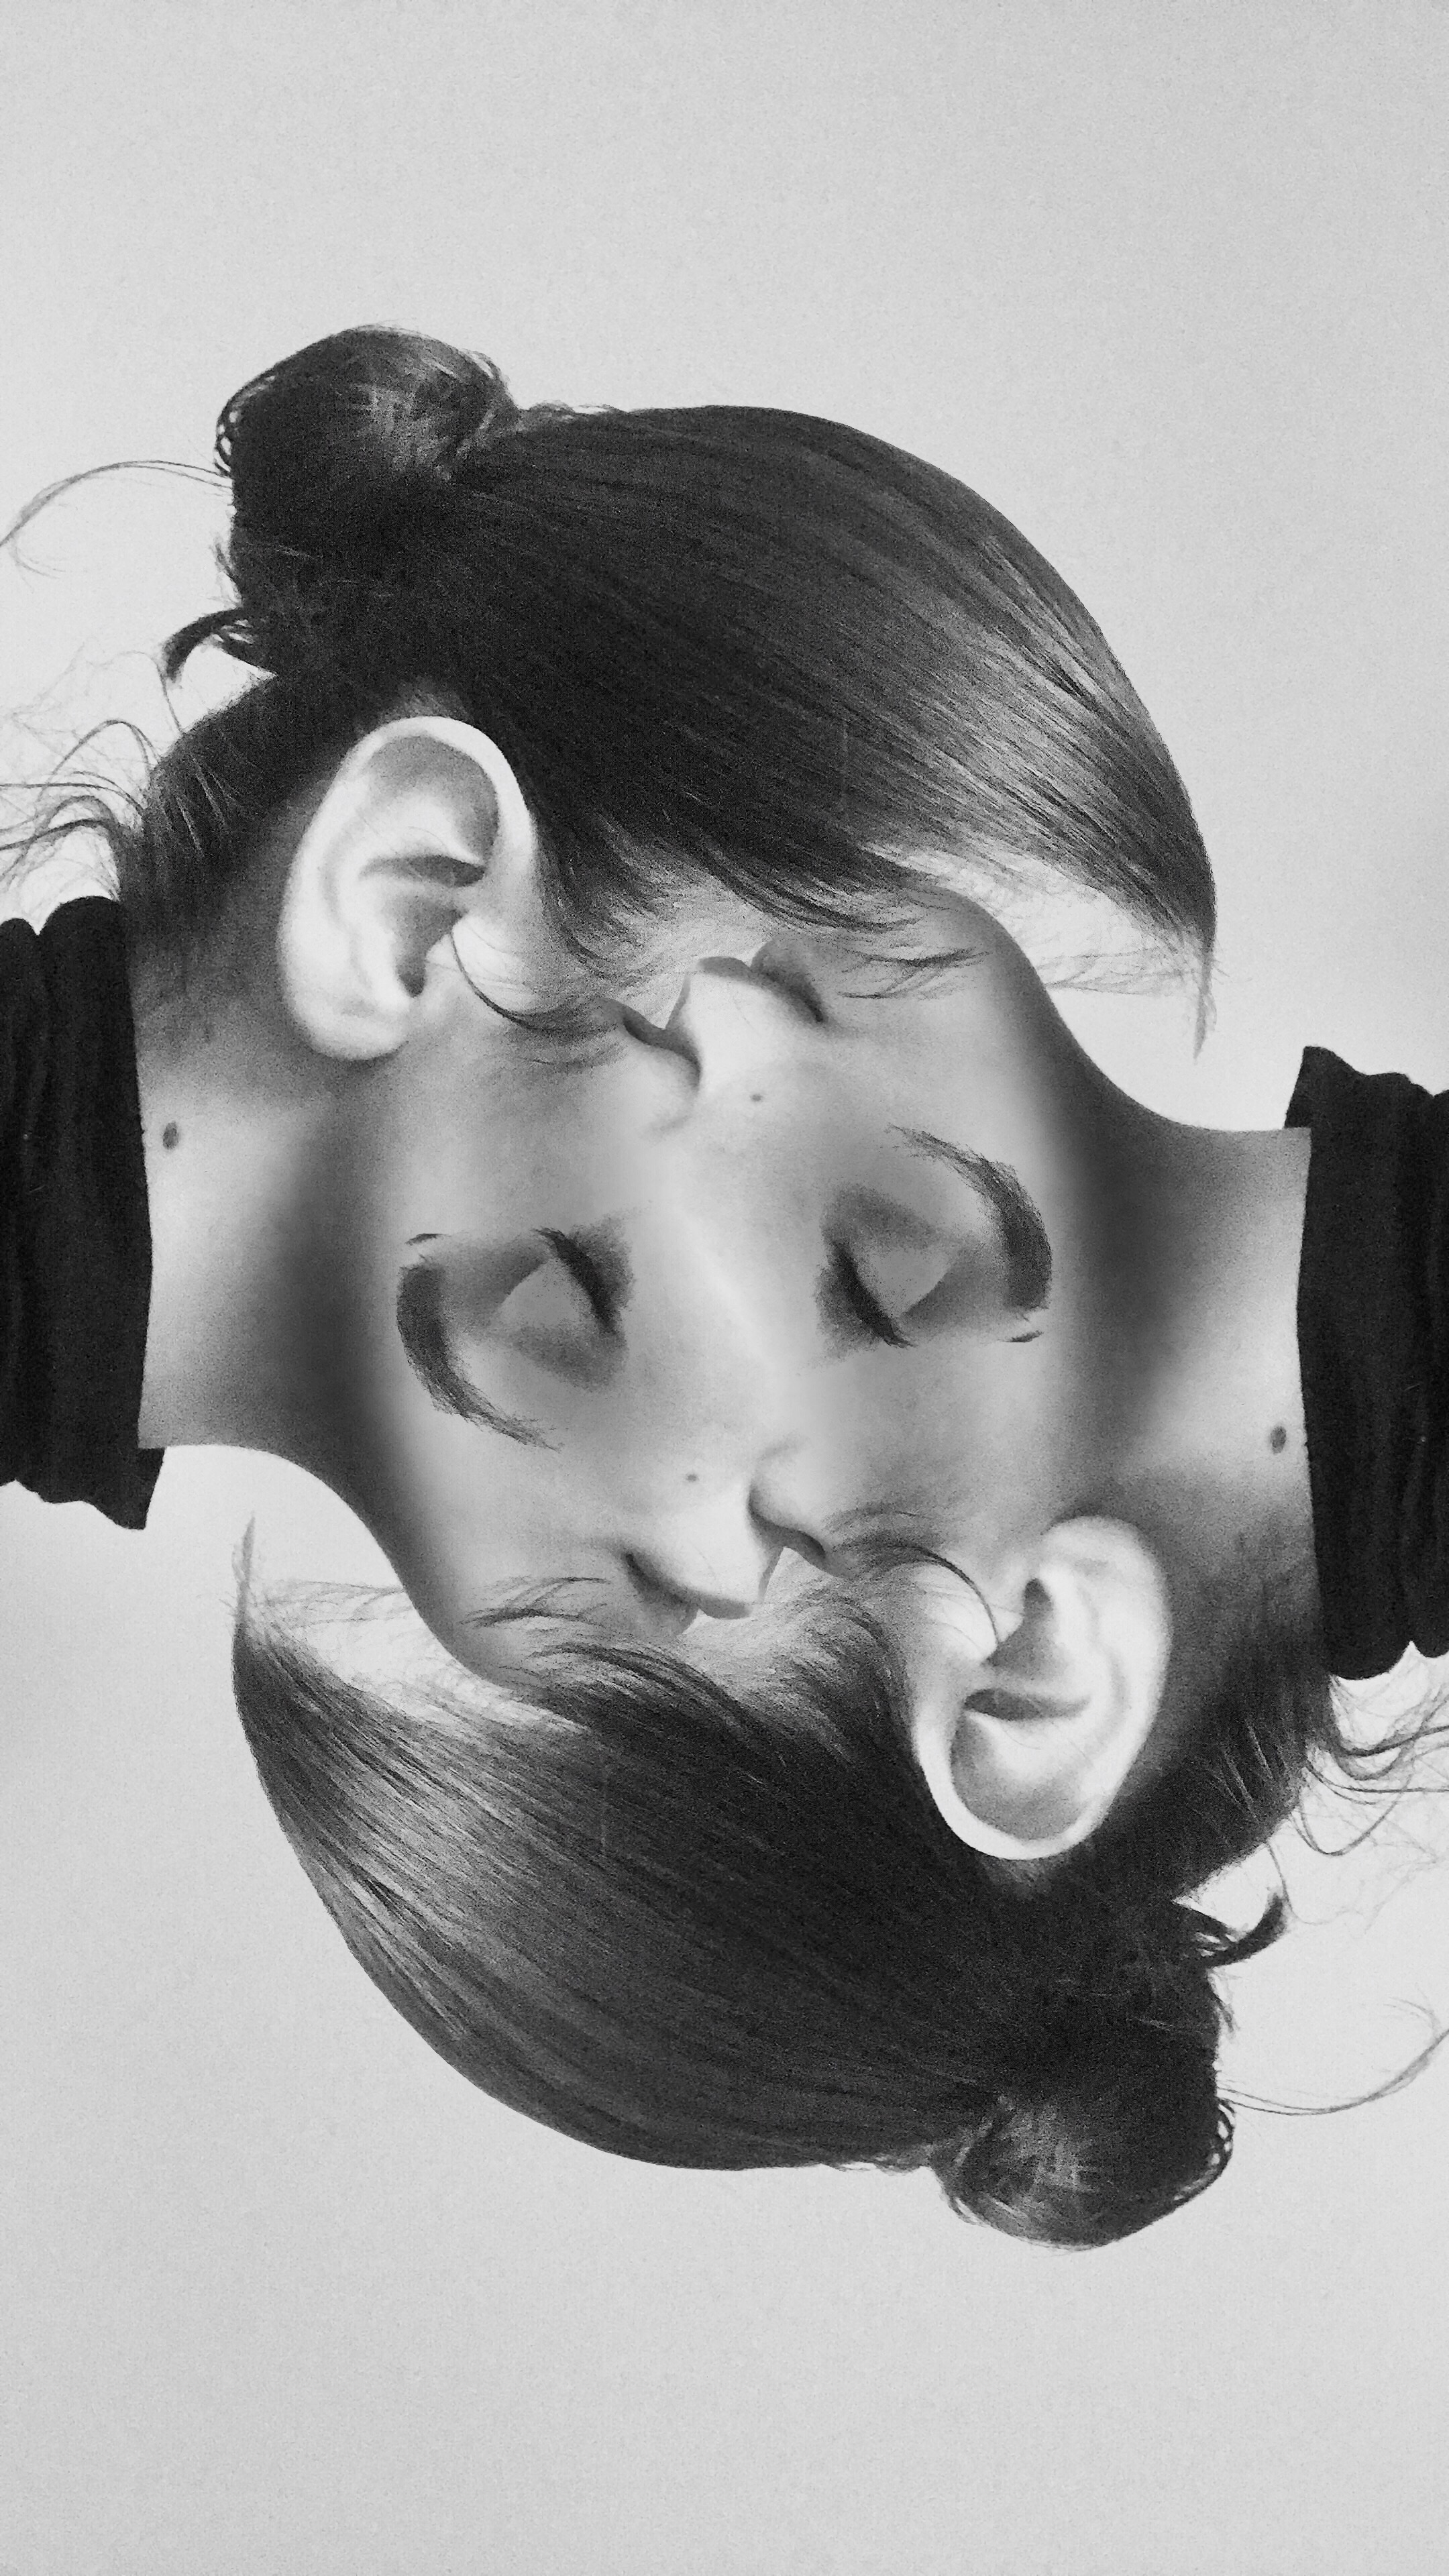 Marianna_Self Portrait.JPG